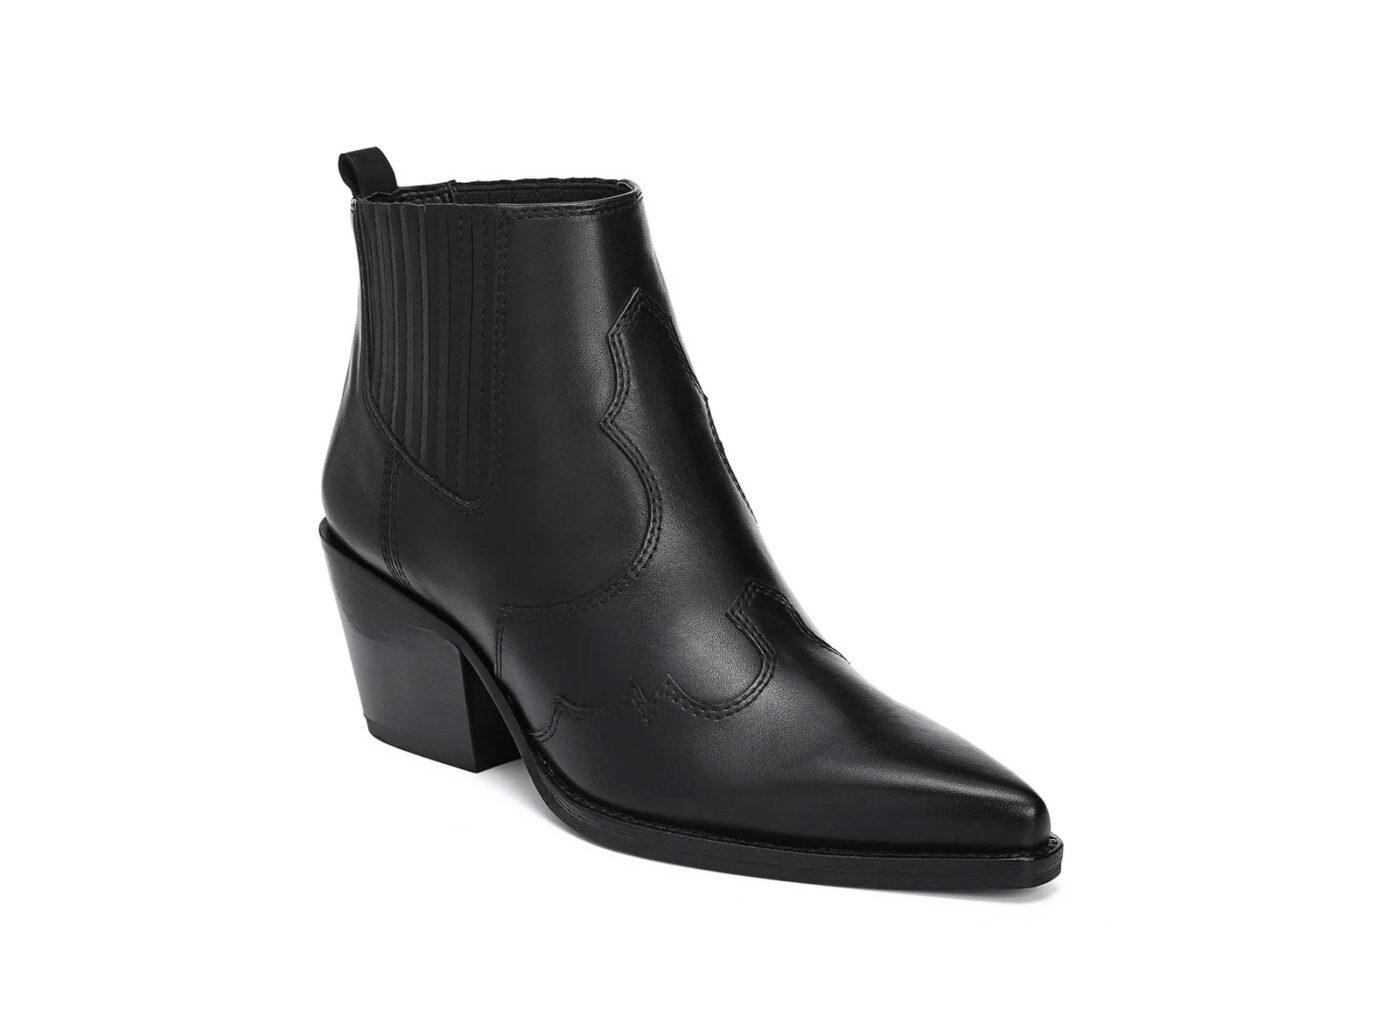 Sam Edelman Winona Pointed-Toe Mid-Heel Leather Booties